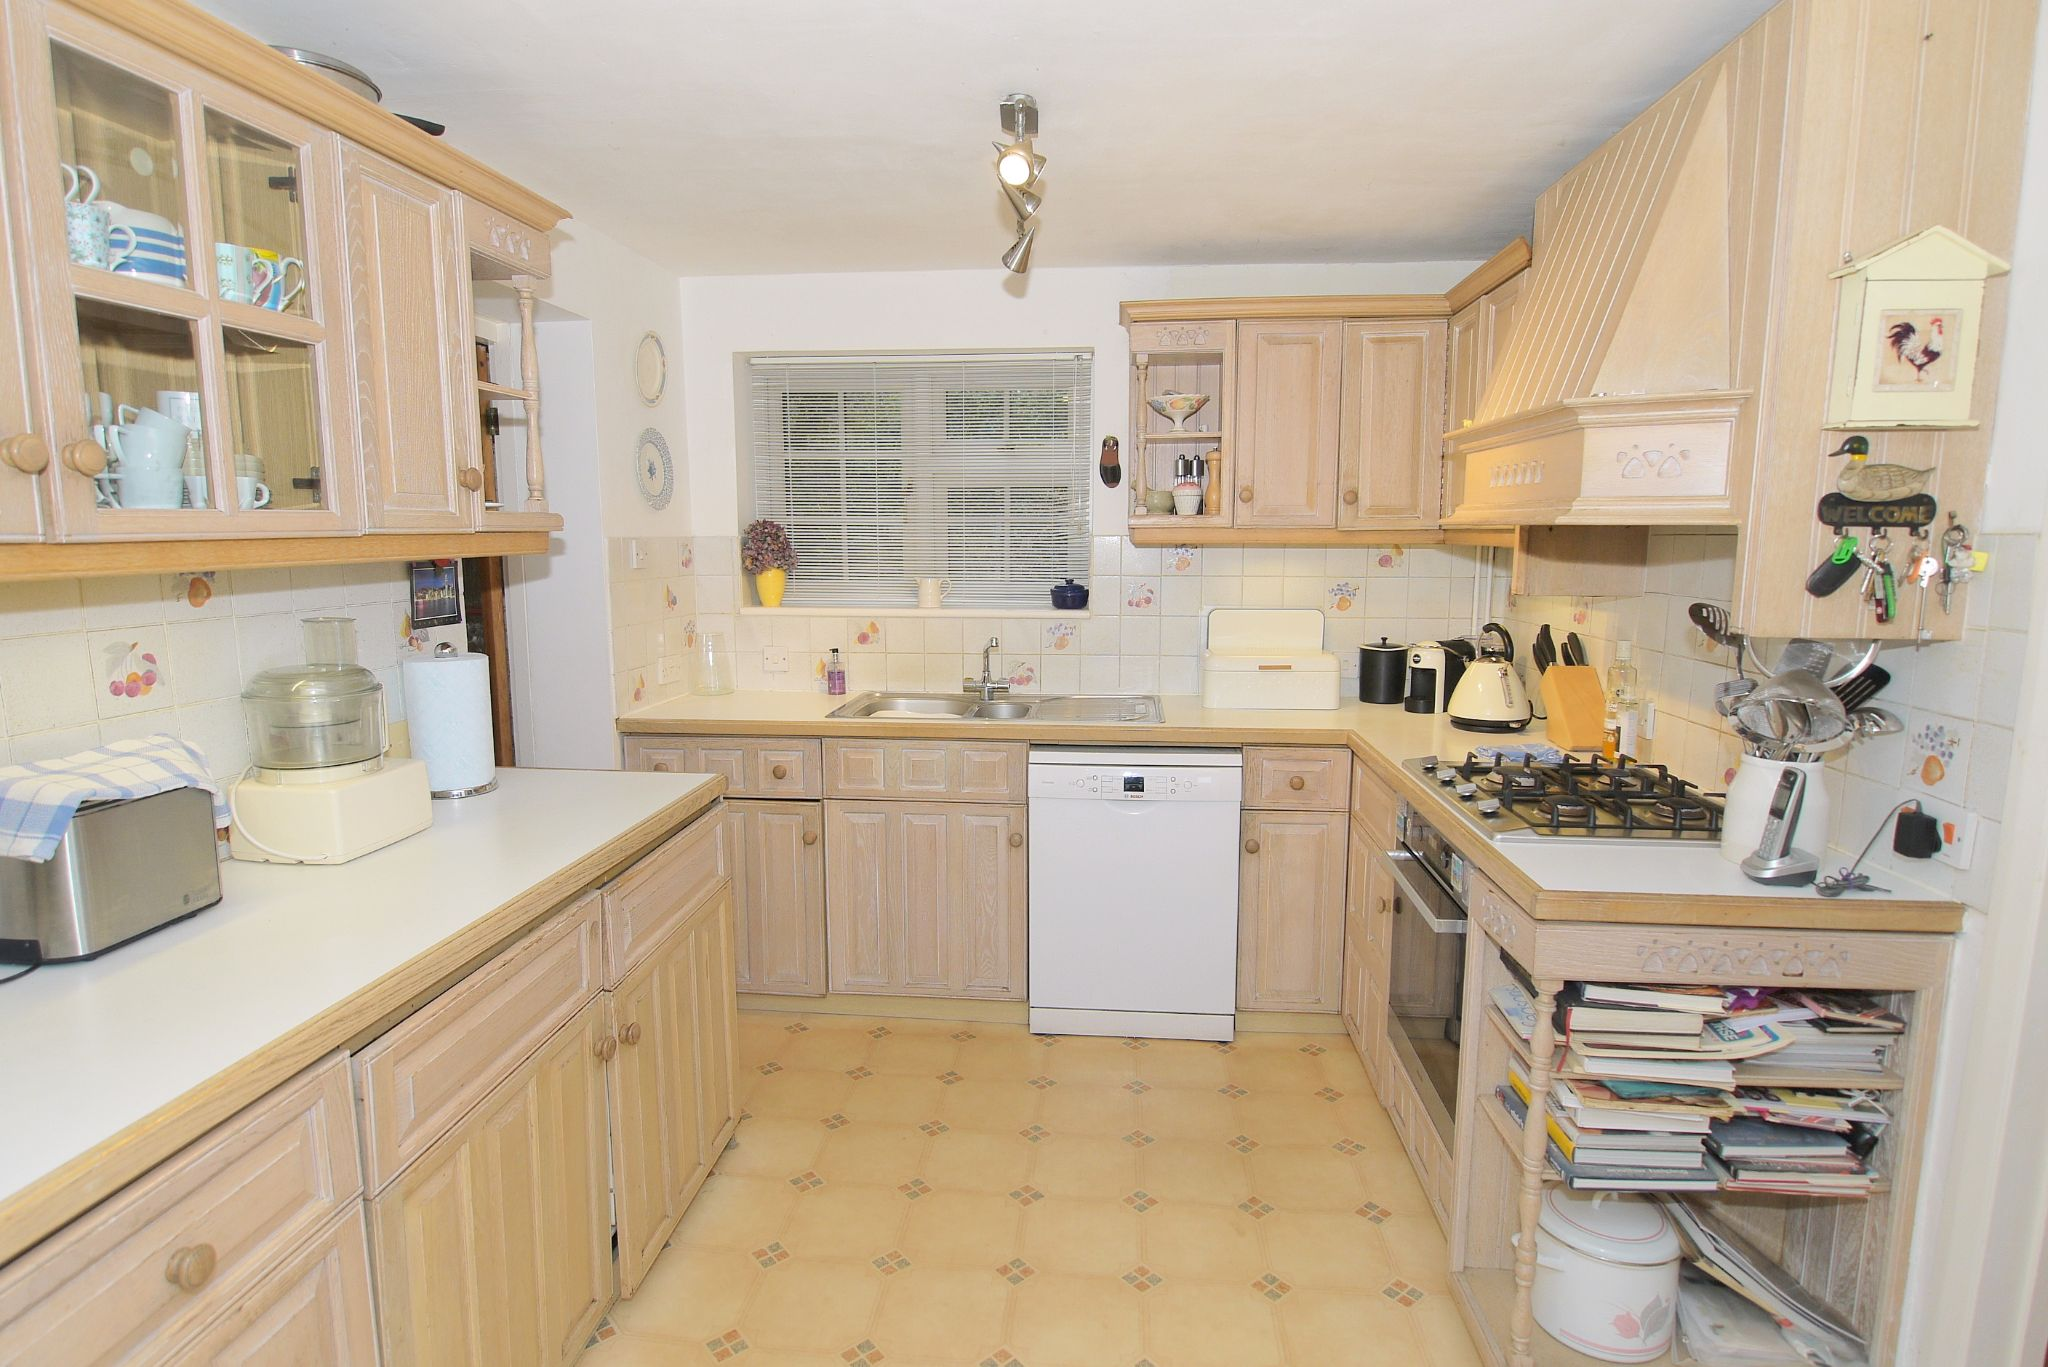 4 bedroom detached house Sold in Sevenoaks - Photograph 8